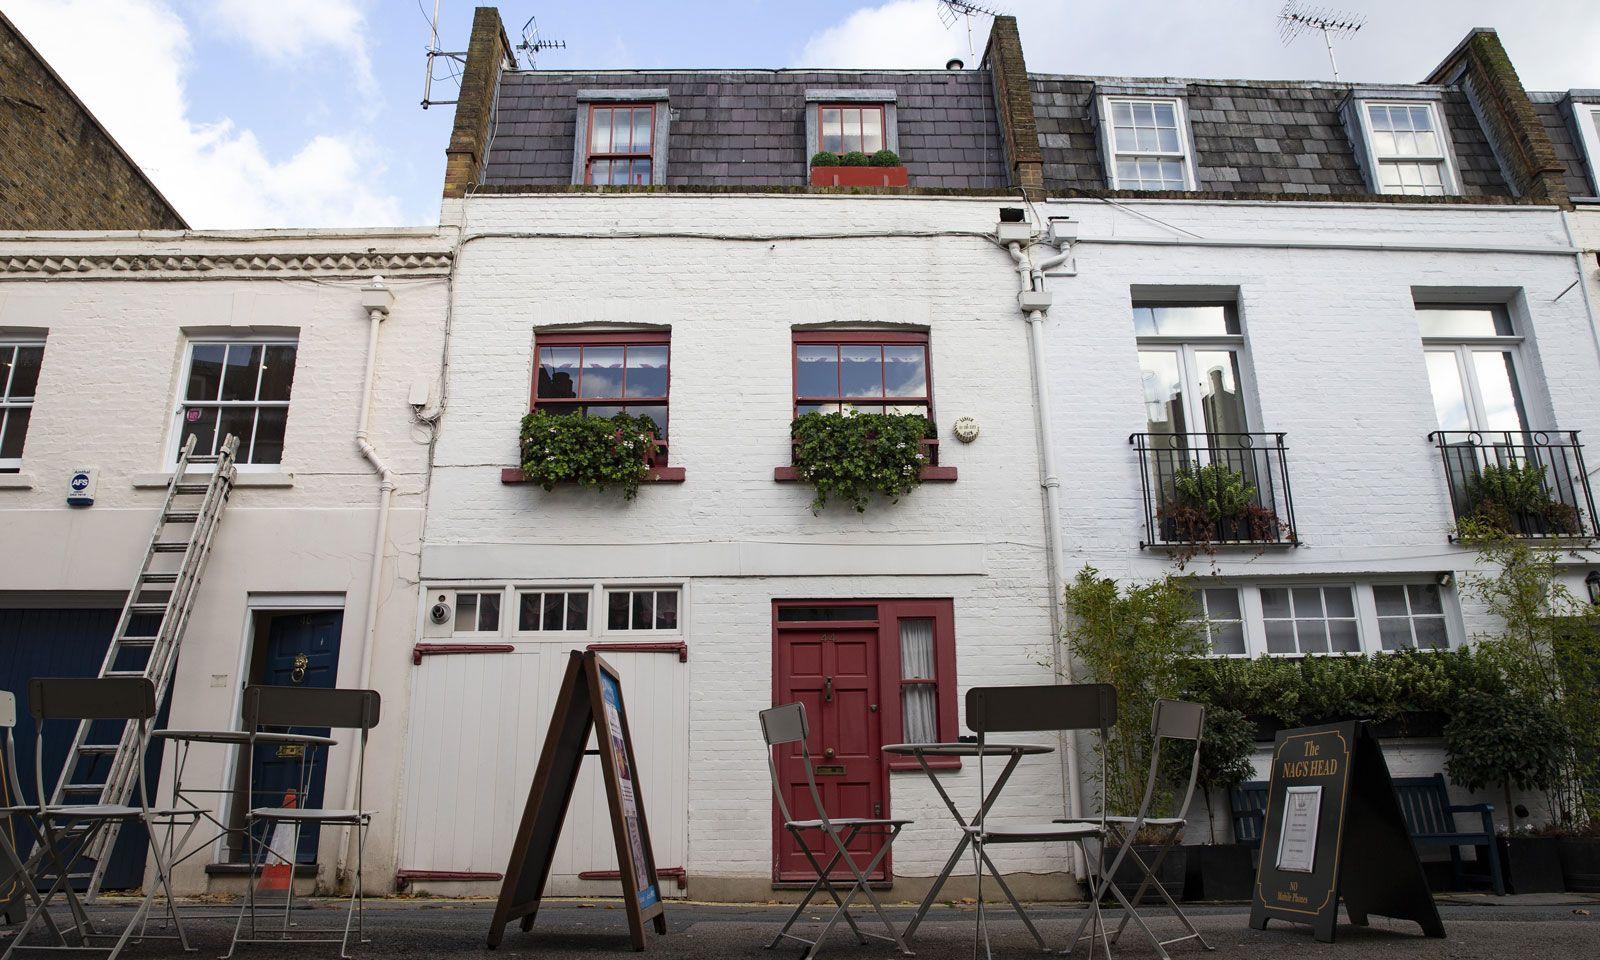 Ghislaine Maxwells Haus in London.